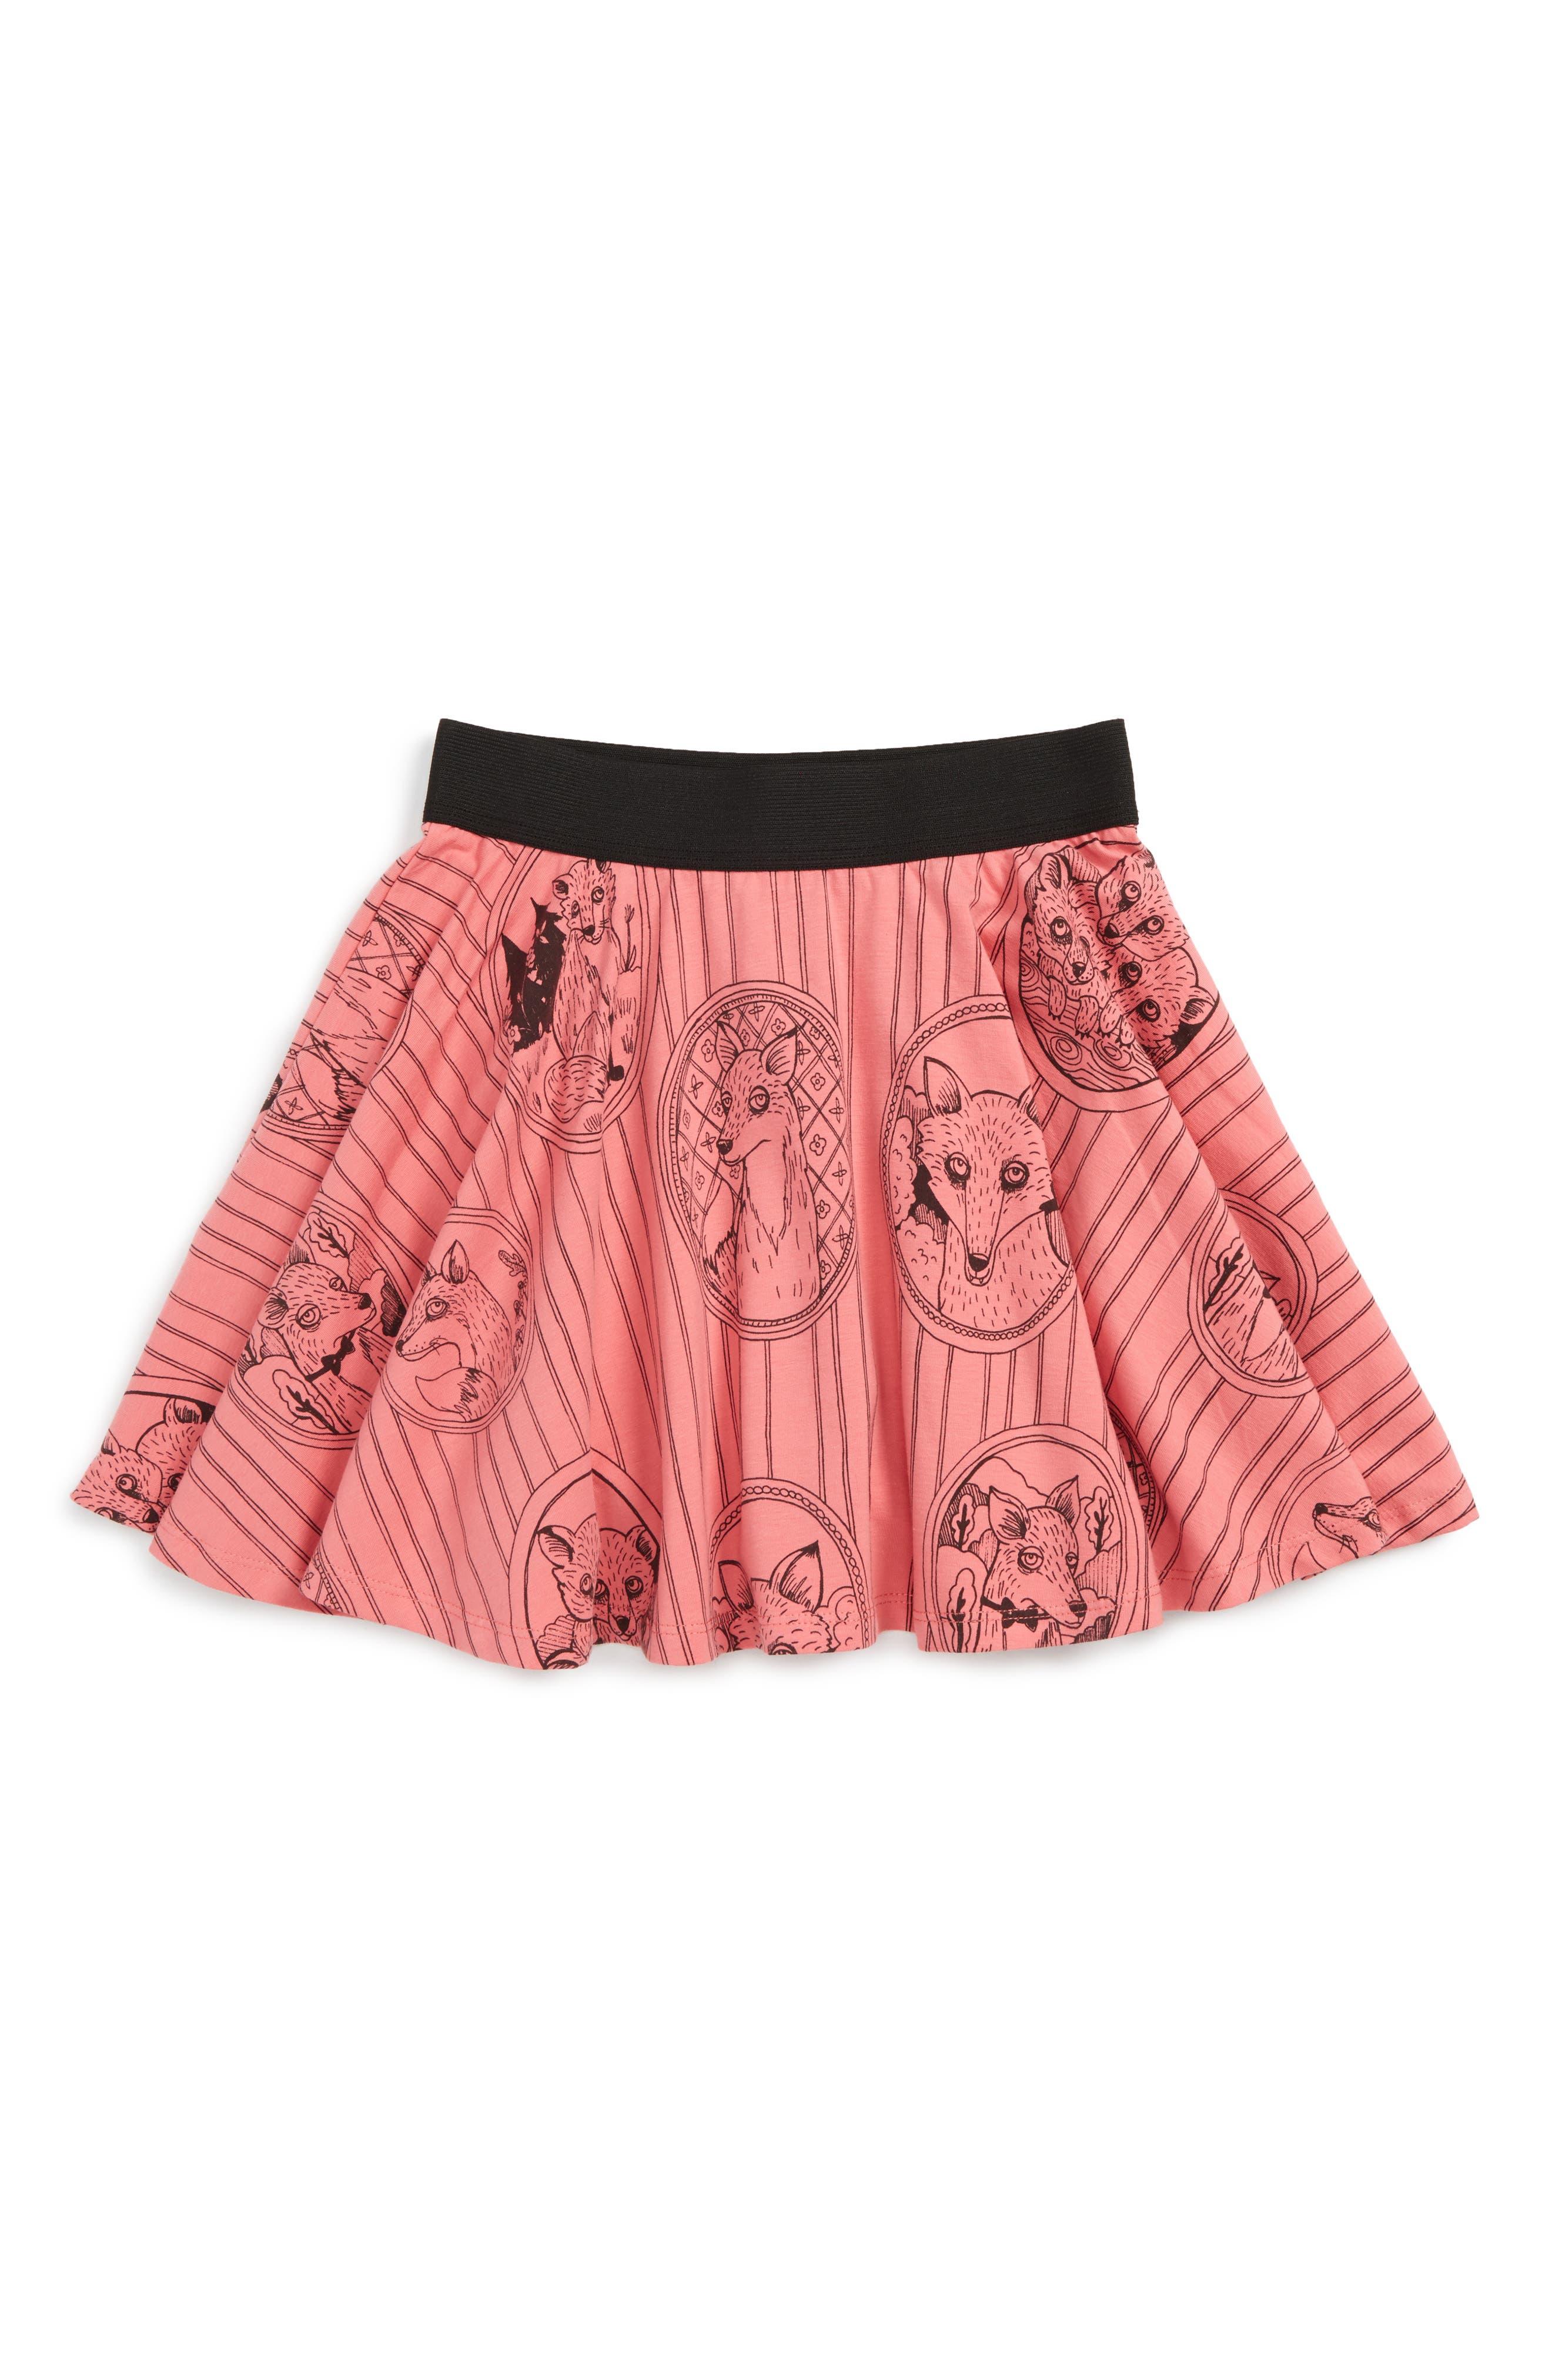 Fox Family Skirt,                         Main,                         color, Pink